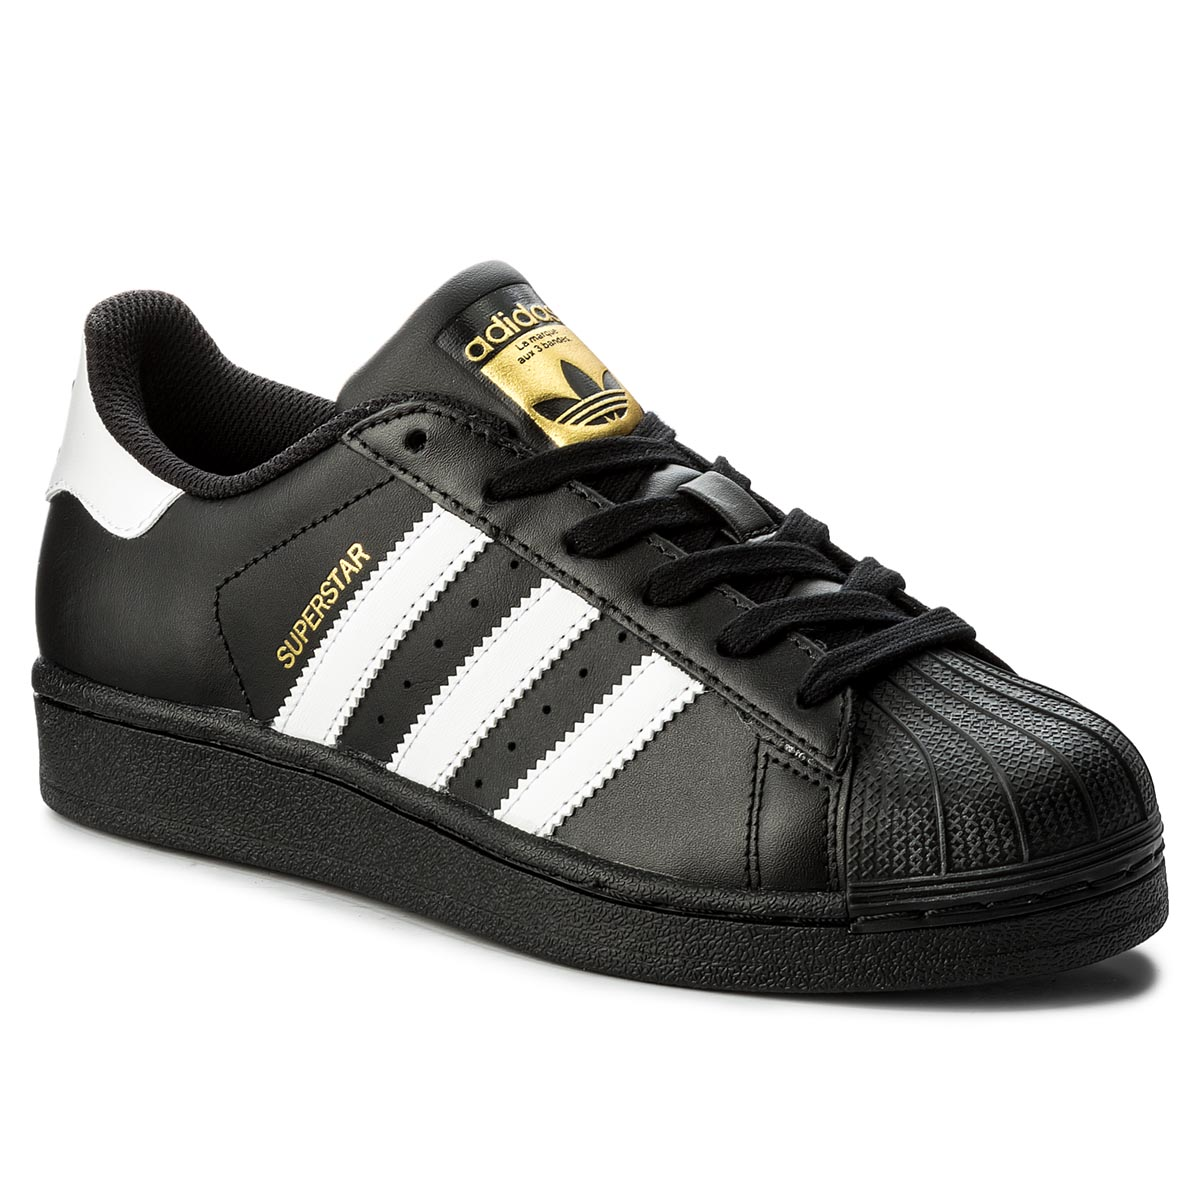 Topánky adidas - Superstar B23642 CBlack/FtWht/CBlack